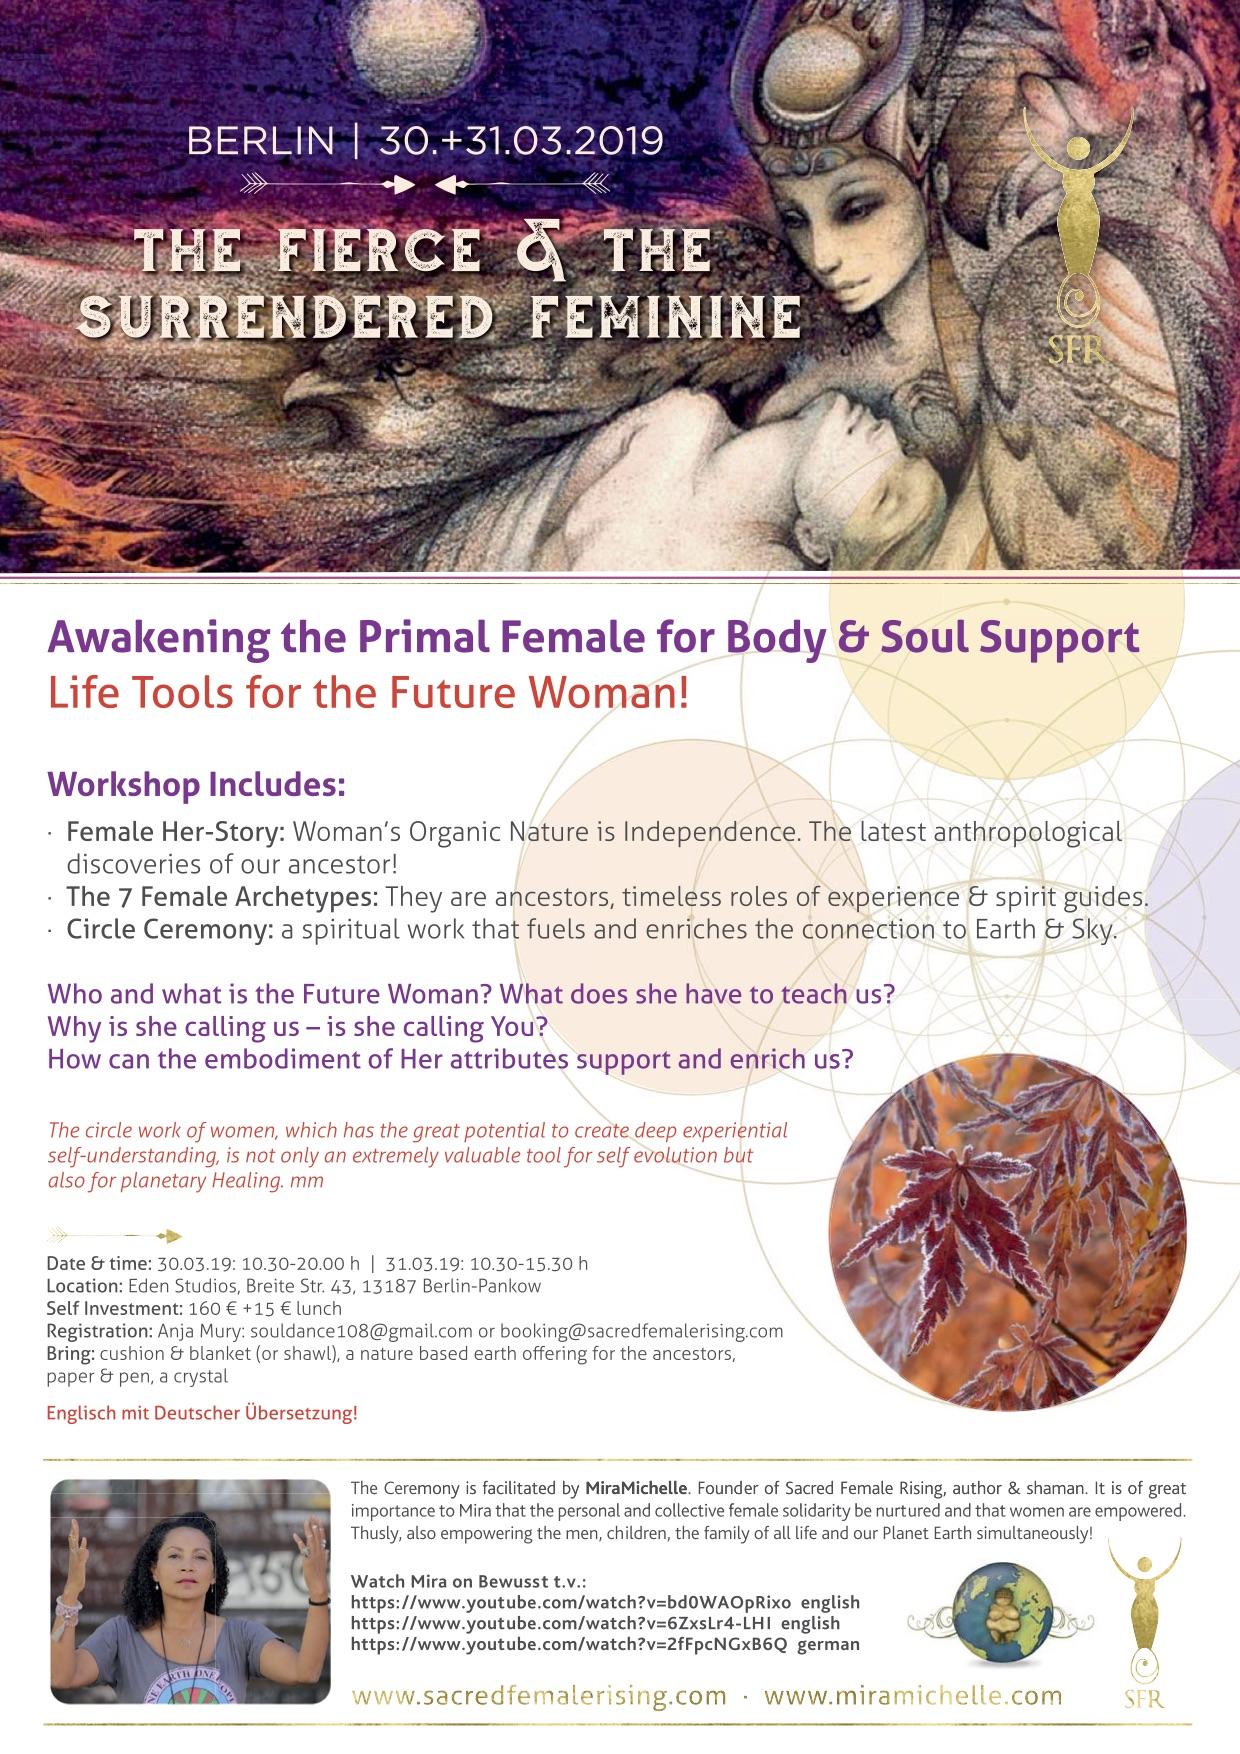 fierce and surrendered feminine_2019